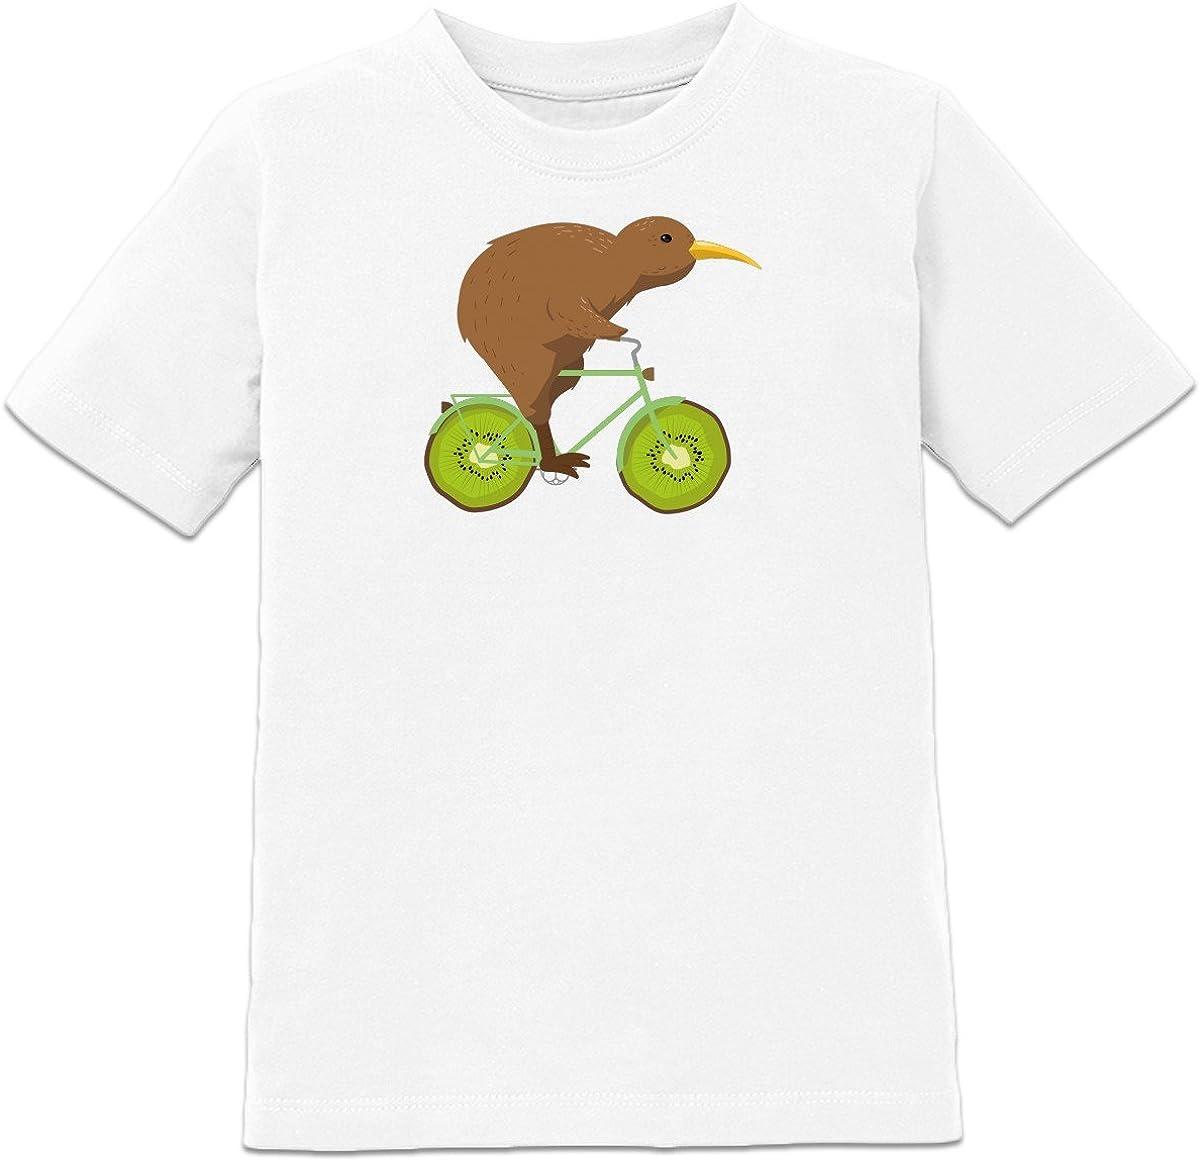 Shirtcity Camiseta de niño Kiwi Riding Kiwi-Bike by: Amazon.es: Ropa y accesorios